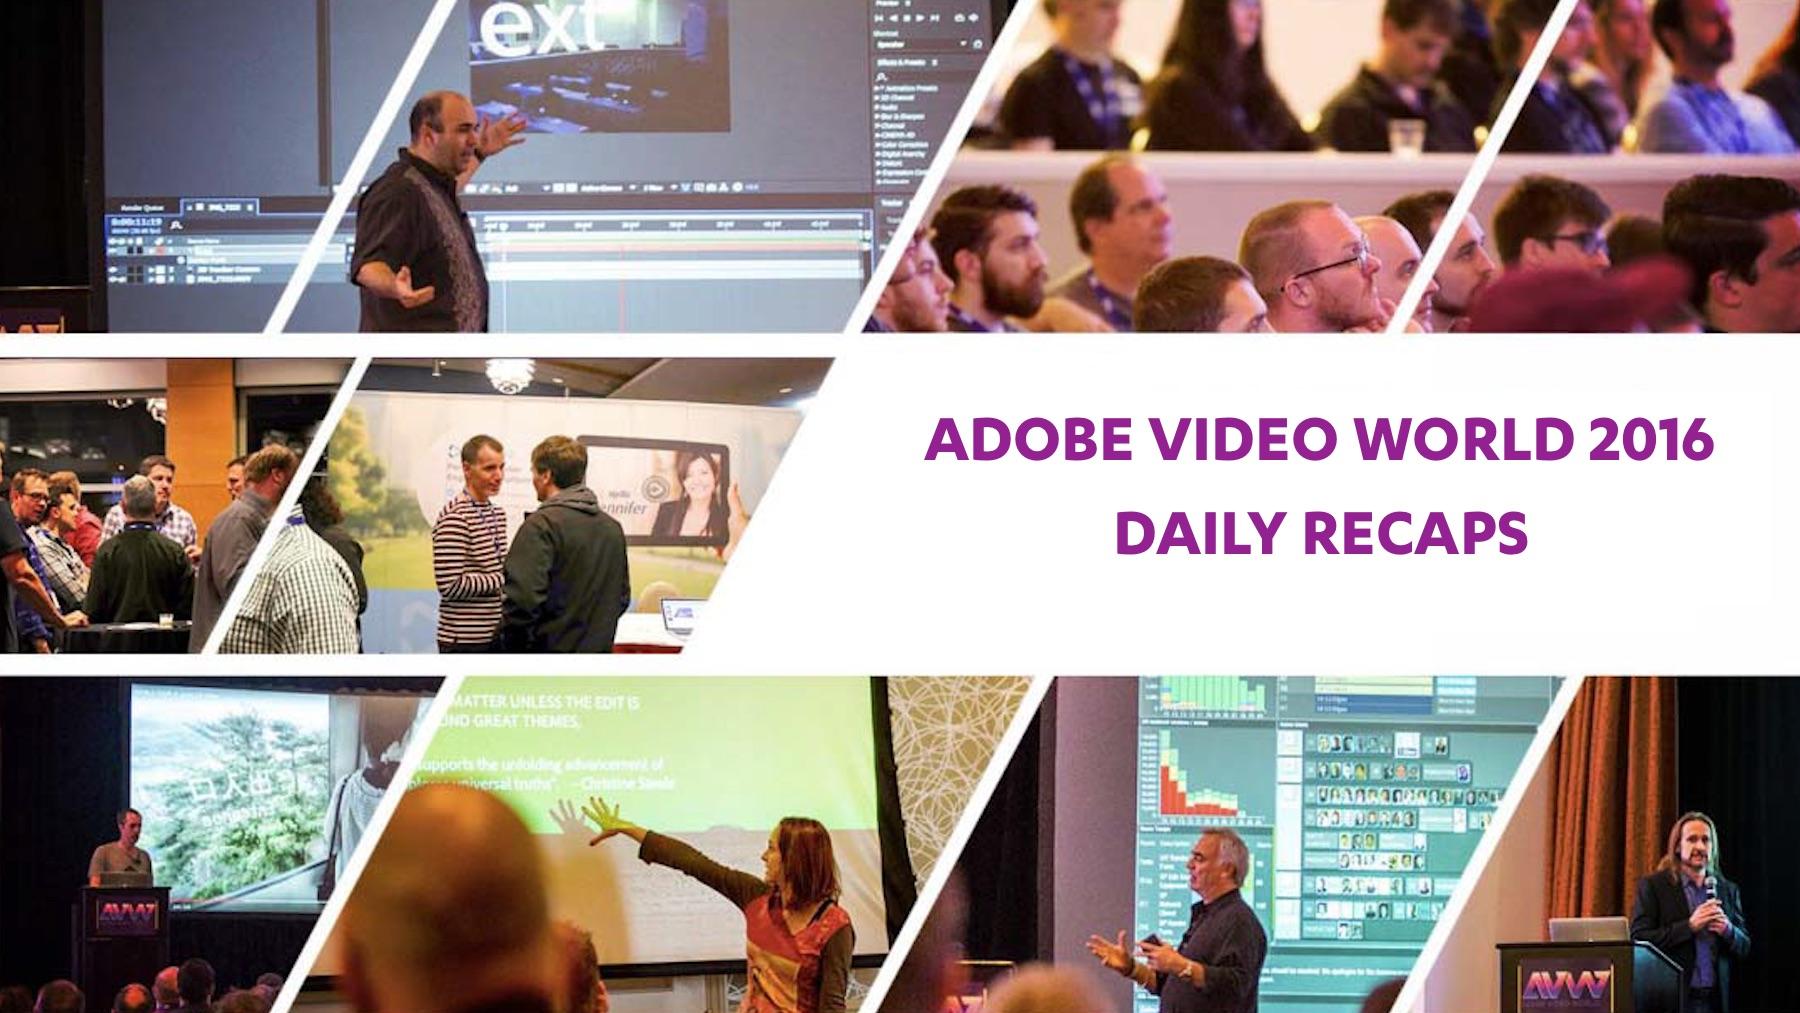 adobe-video-world-2016-daily-recaps